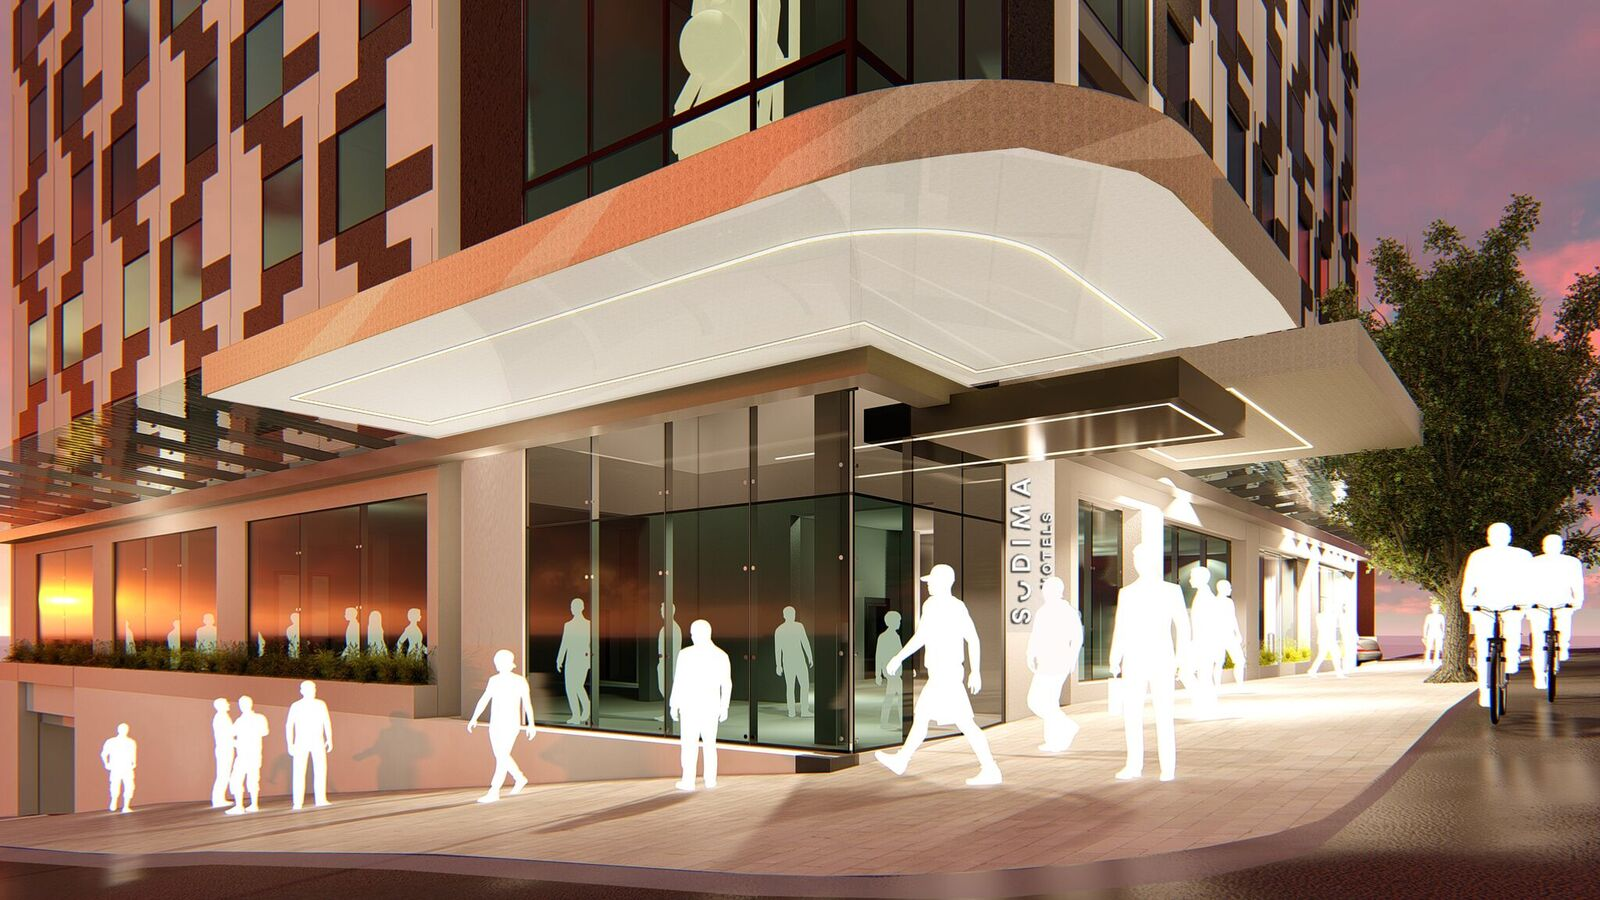 Artist's impression of the Auckland CBD Sudima hotel entrance.